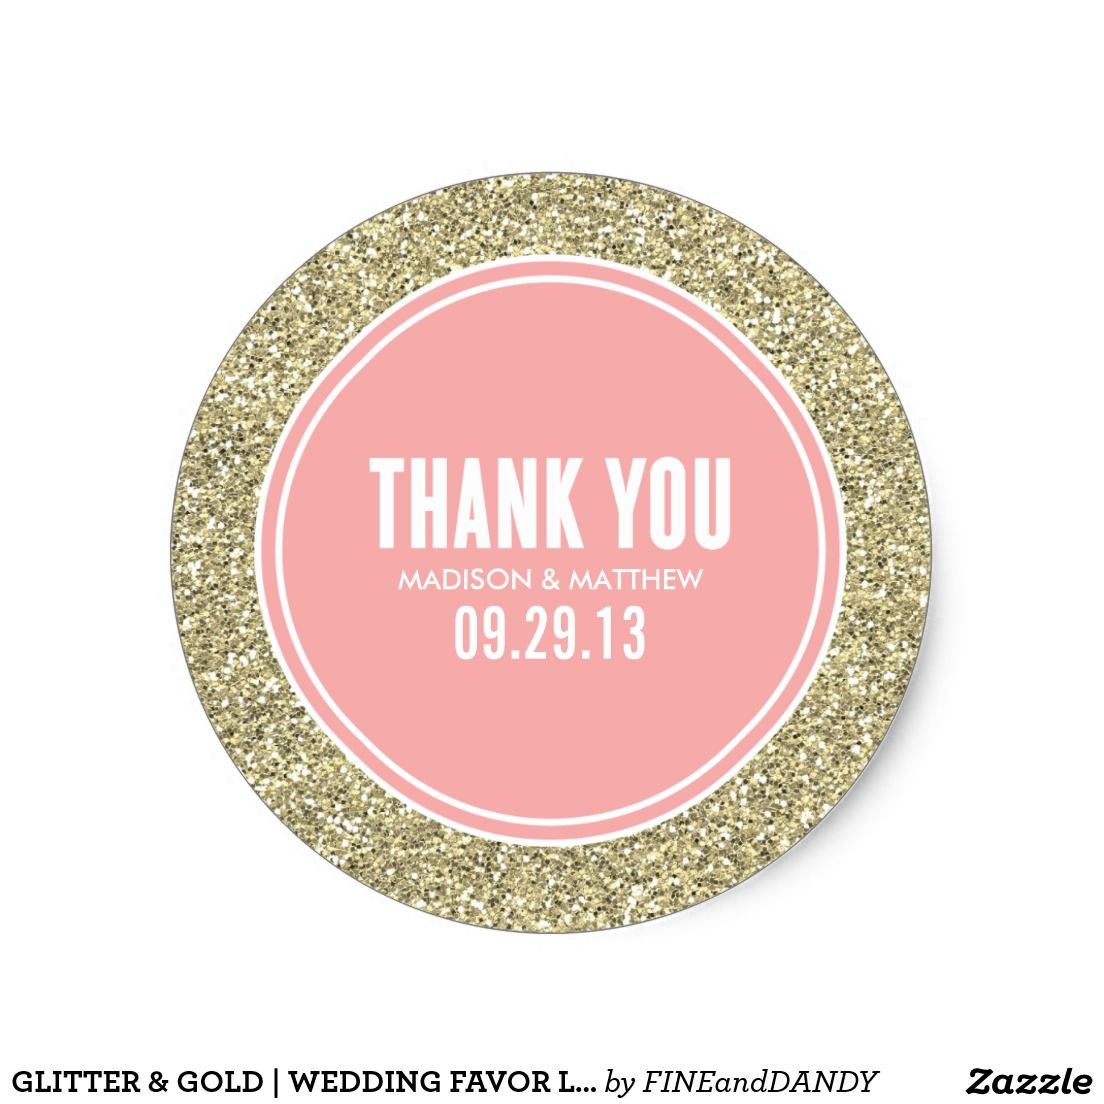 Glitter & gold | wedding favor labels | wedding favor stickers ...